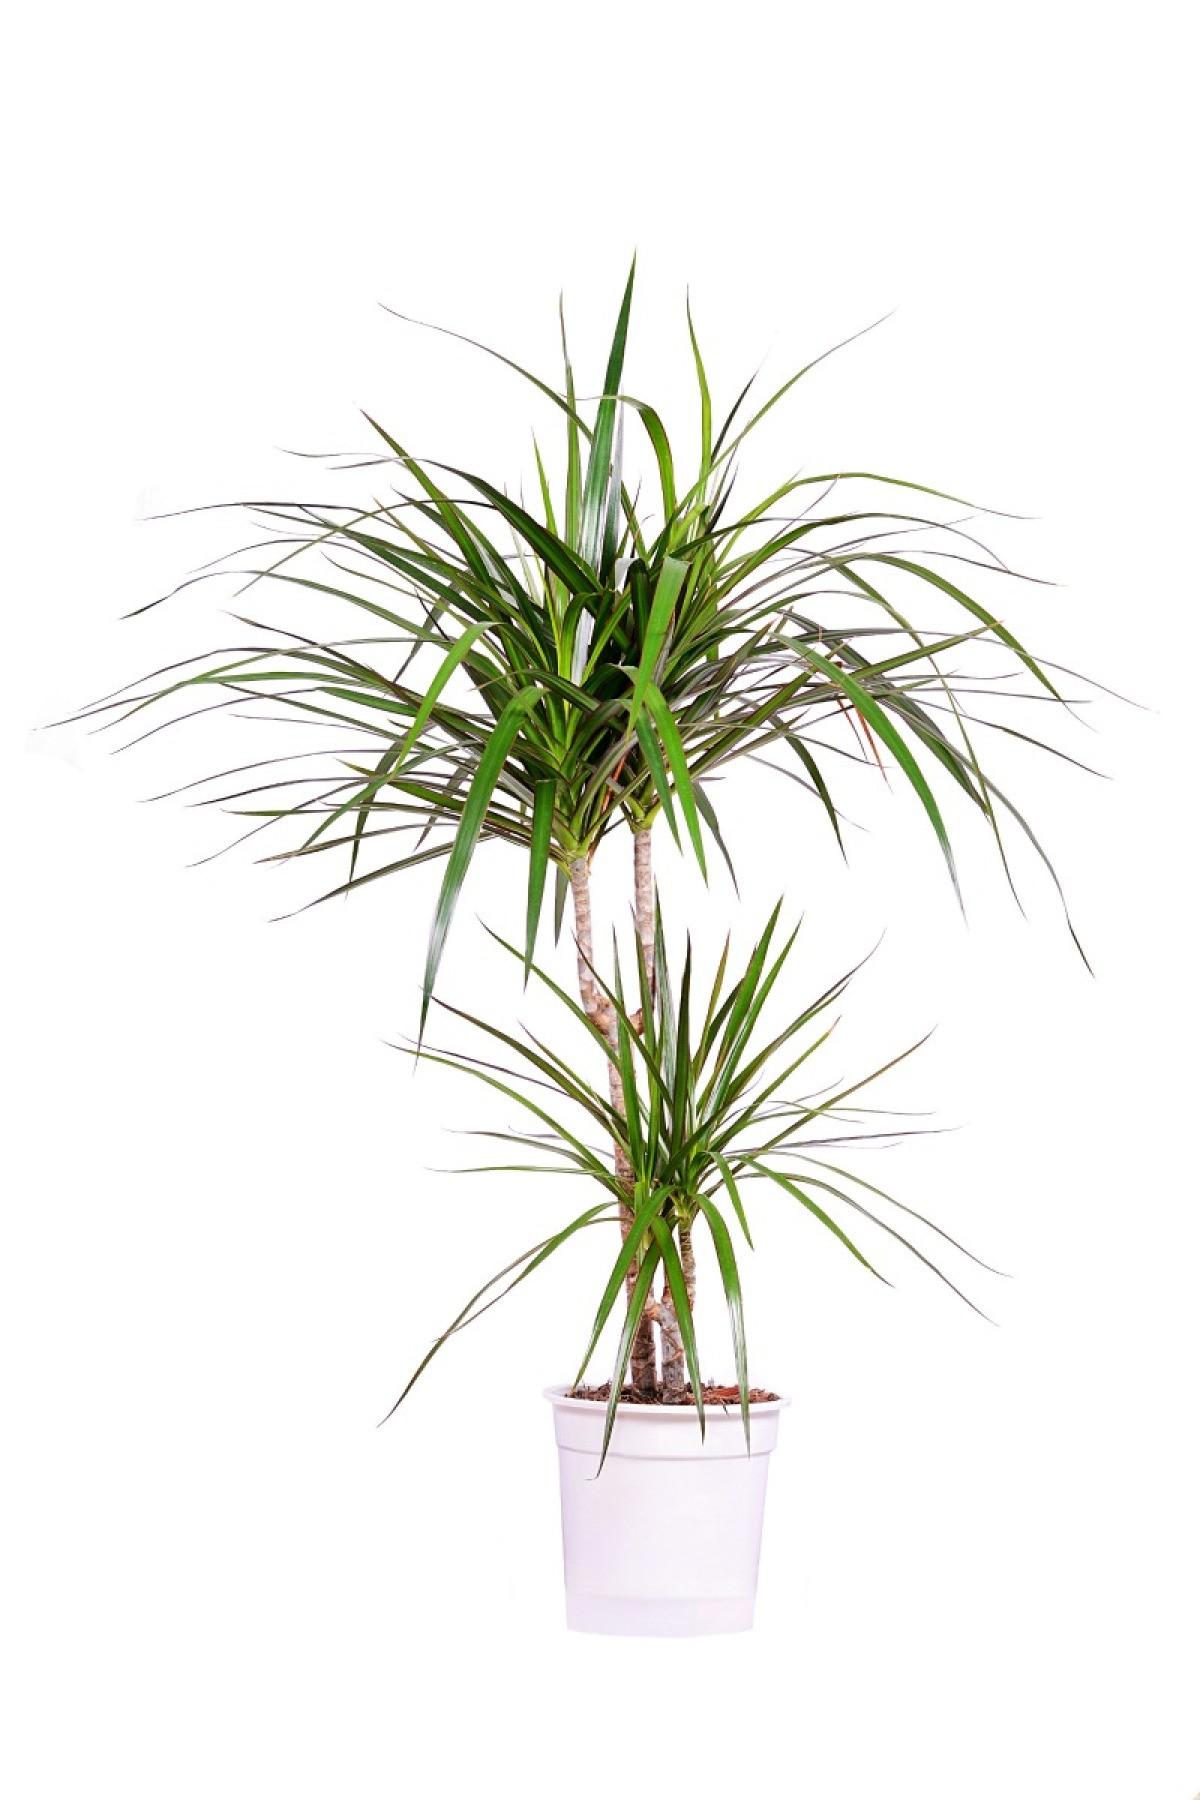 dracaena_tree_x1 Palm House Plant Cutting on sansevieria plant cuttings, polka dot plant cuttings, schefflera plant cuttings, rubber tree plant cuttings,